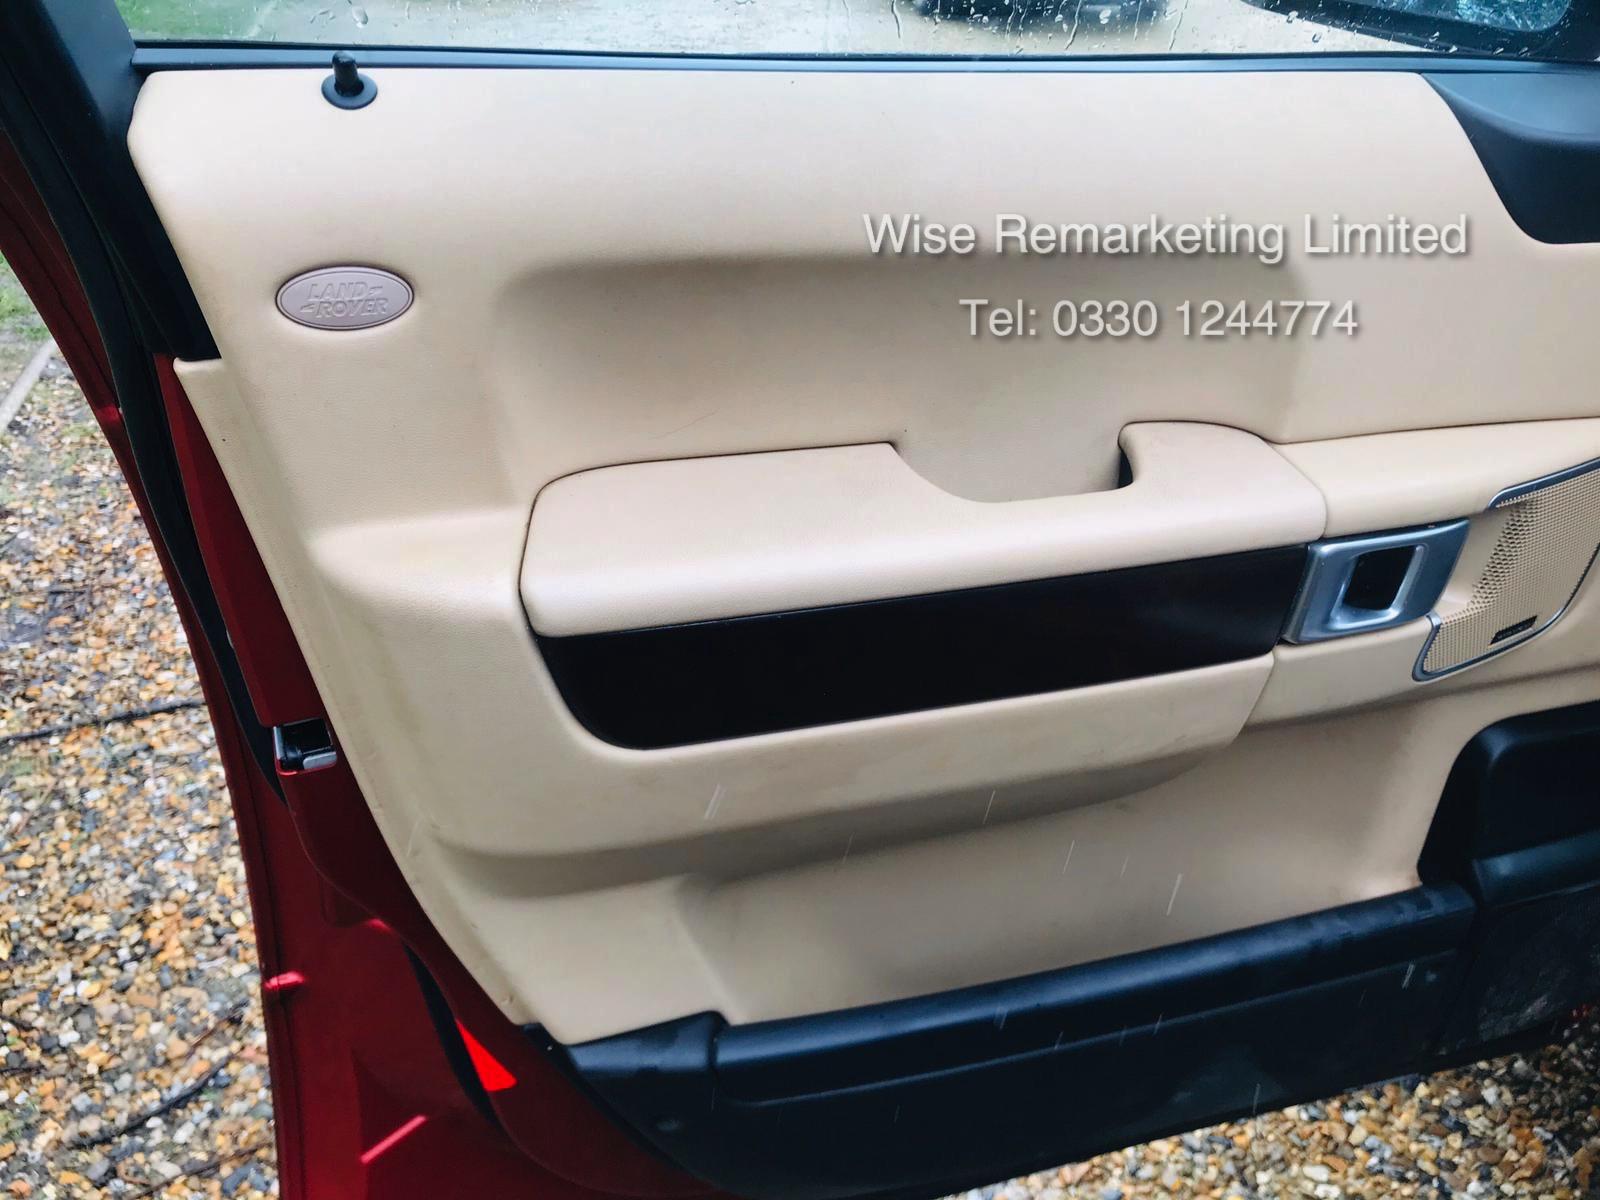 Range Rover Vogue 3.6 TDV8 HSE Auto - 2010 Model - Cream Leather - Service History - - Image 22 of 28